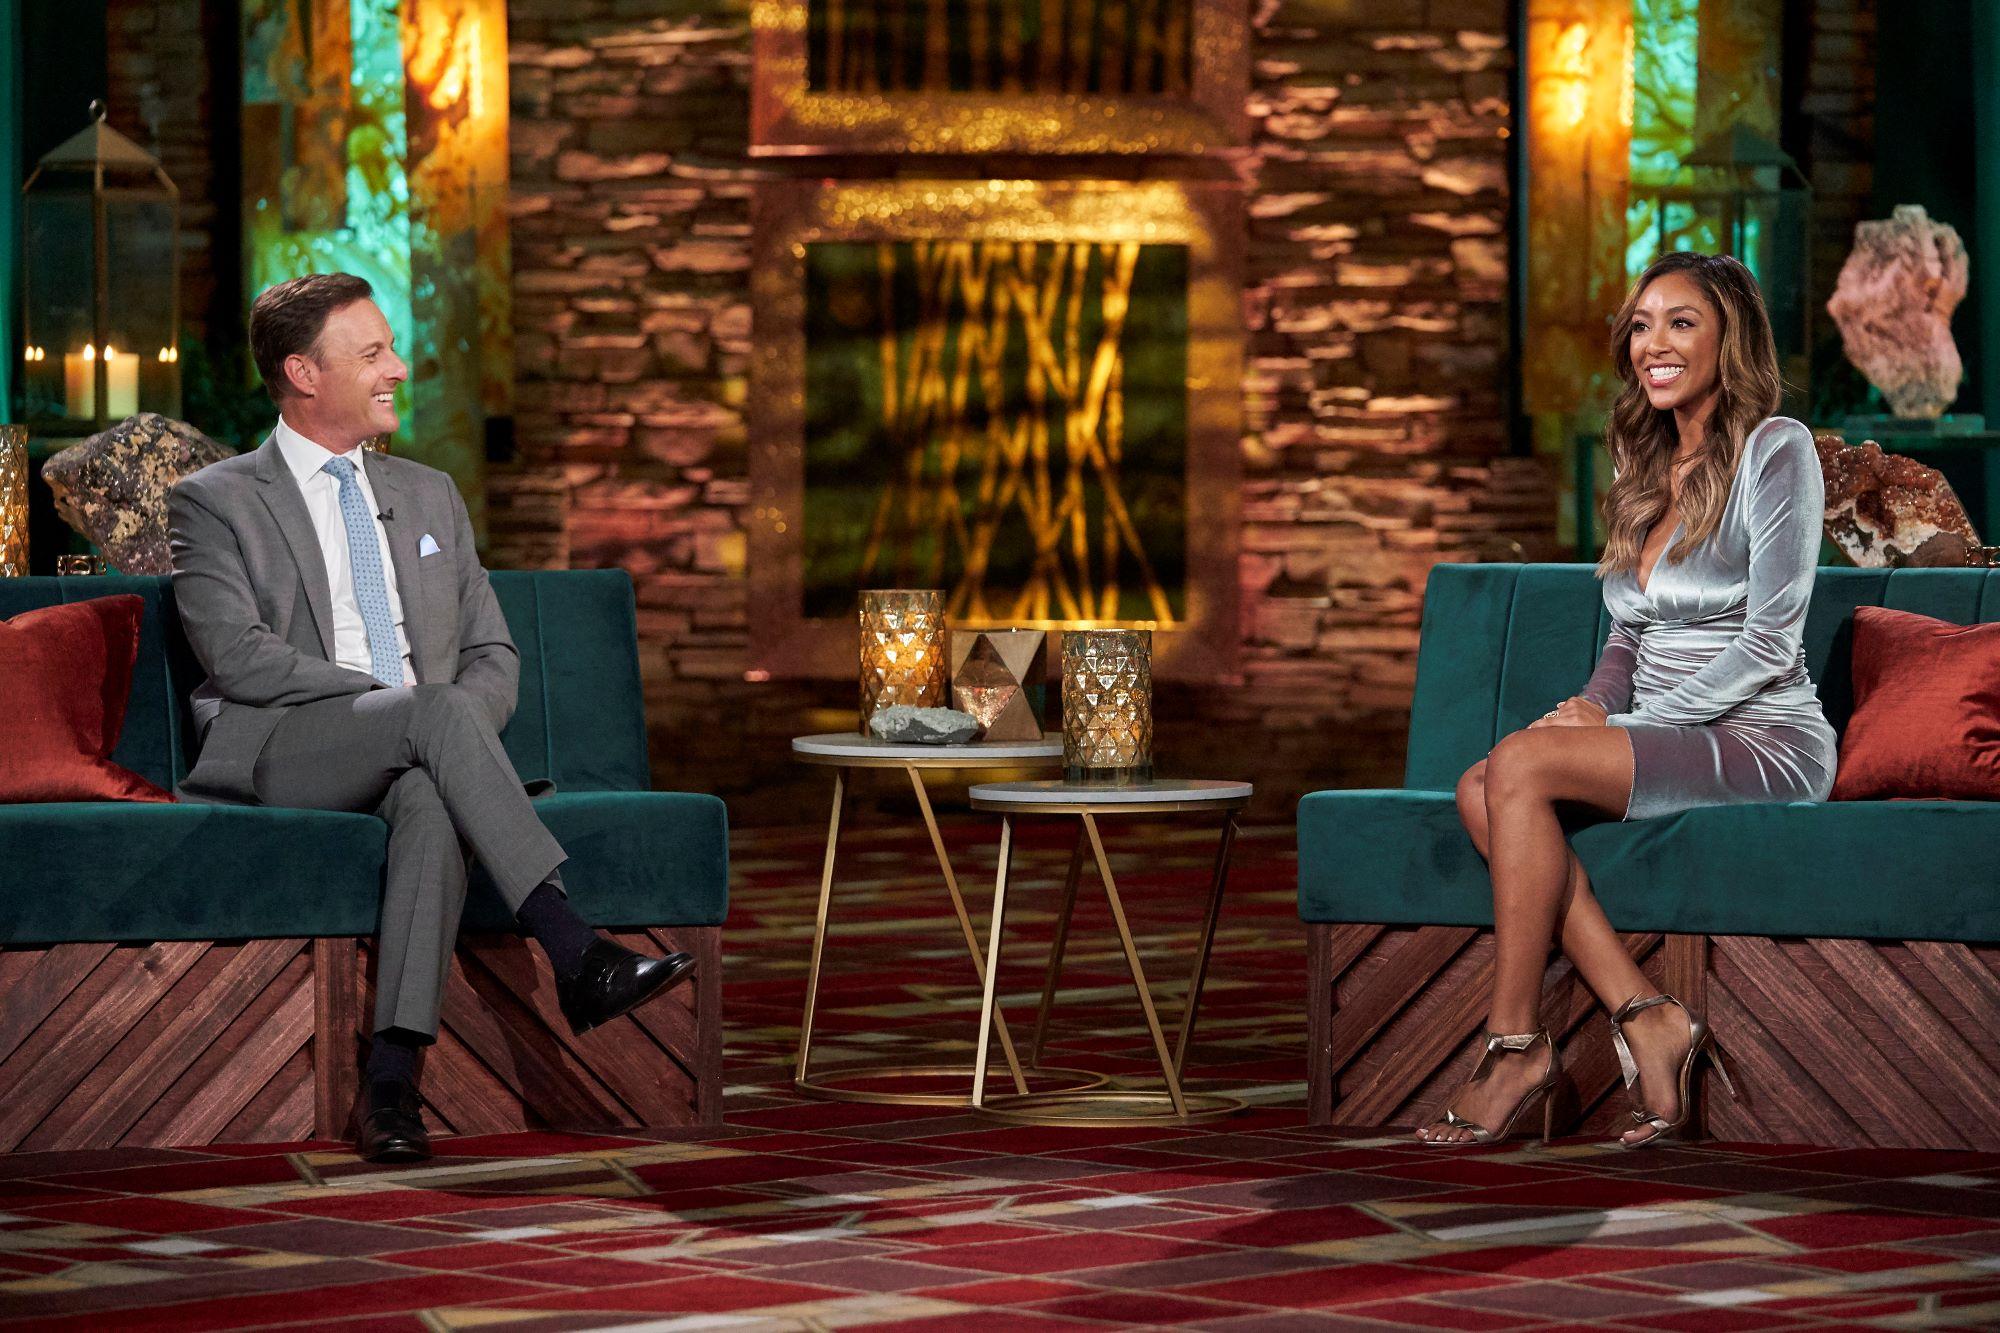 'The Bachelorette' Week 10 recap: Tayshia breaks some hearts